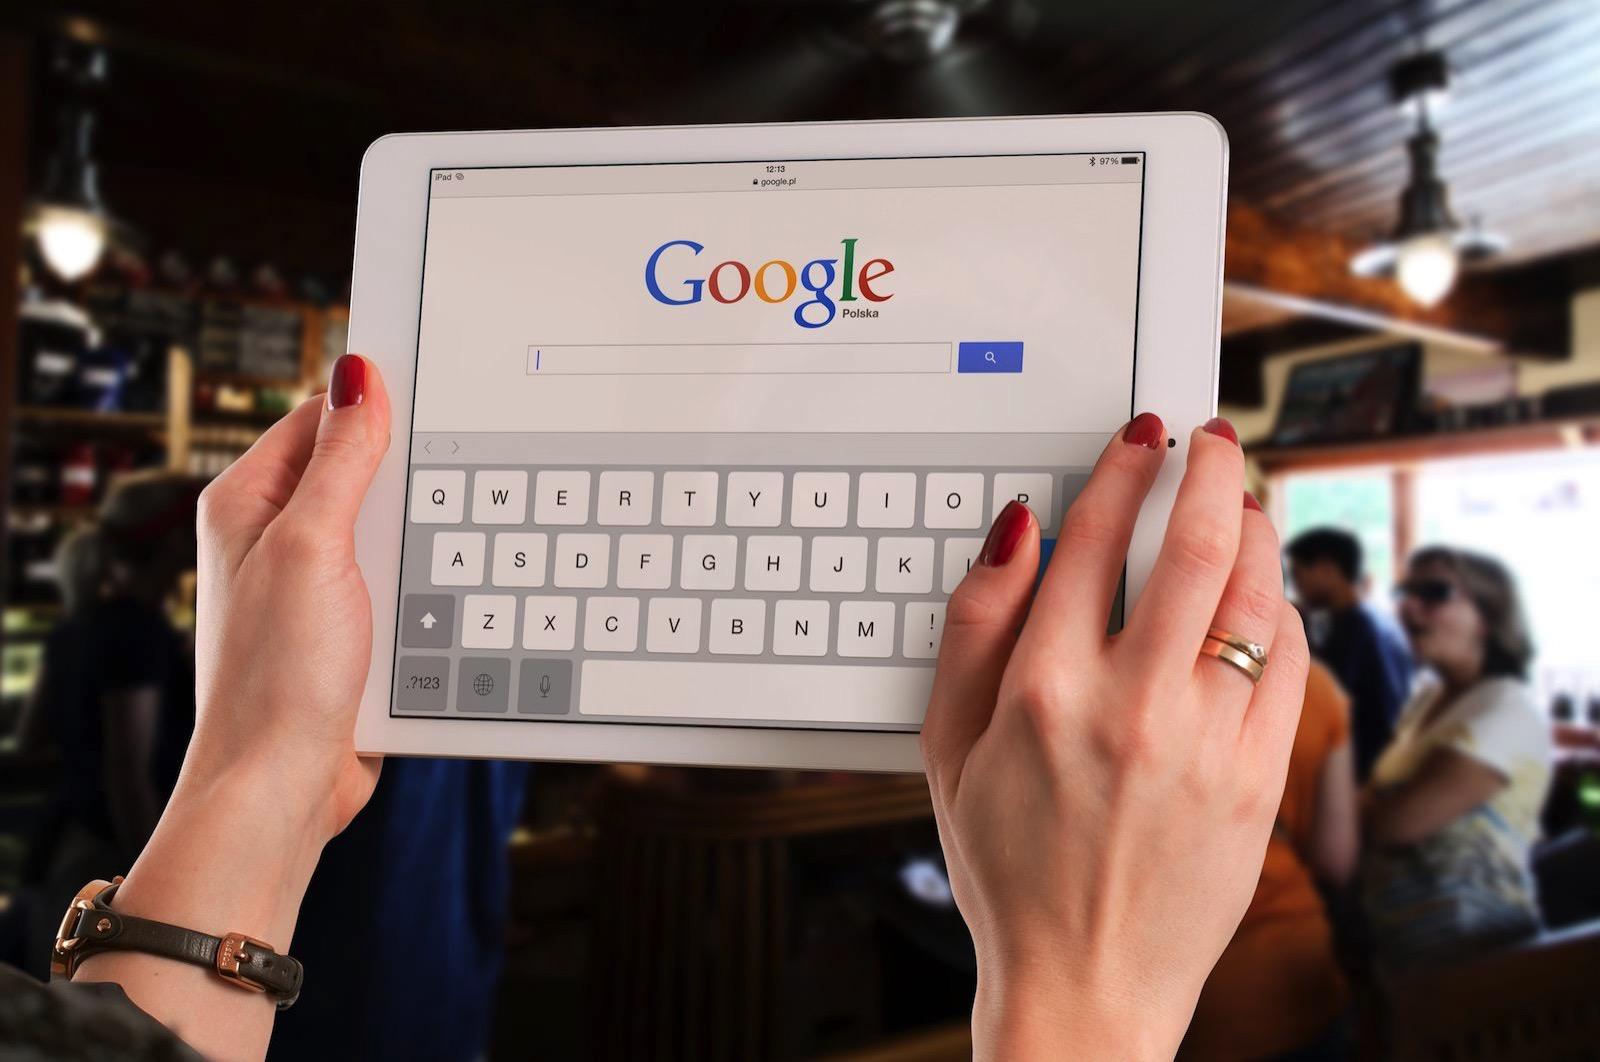 apple-gadget-google-38286.jpg